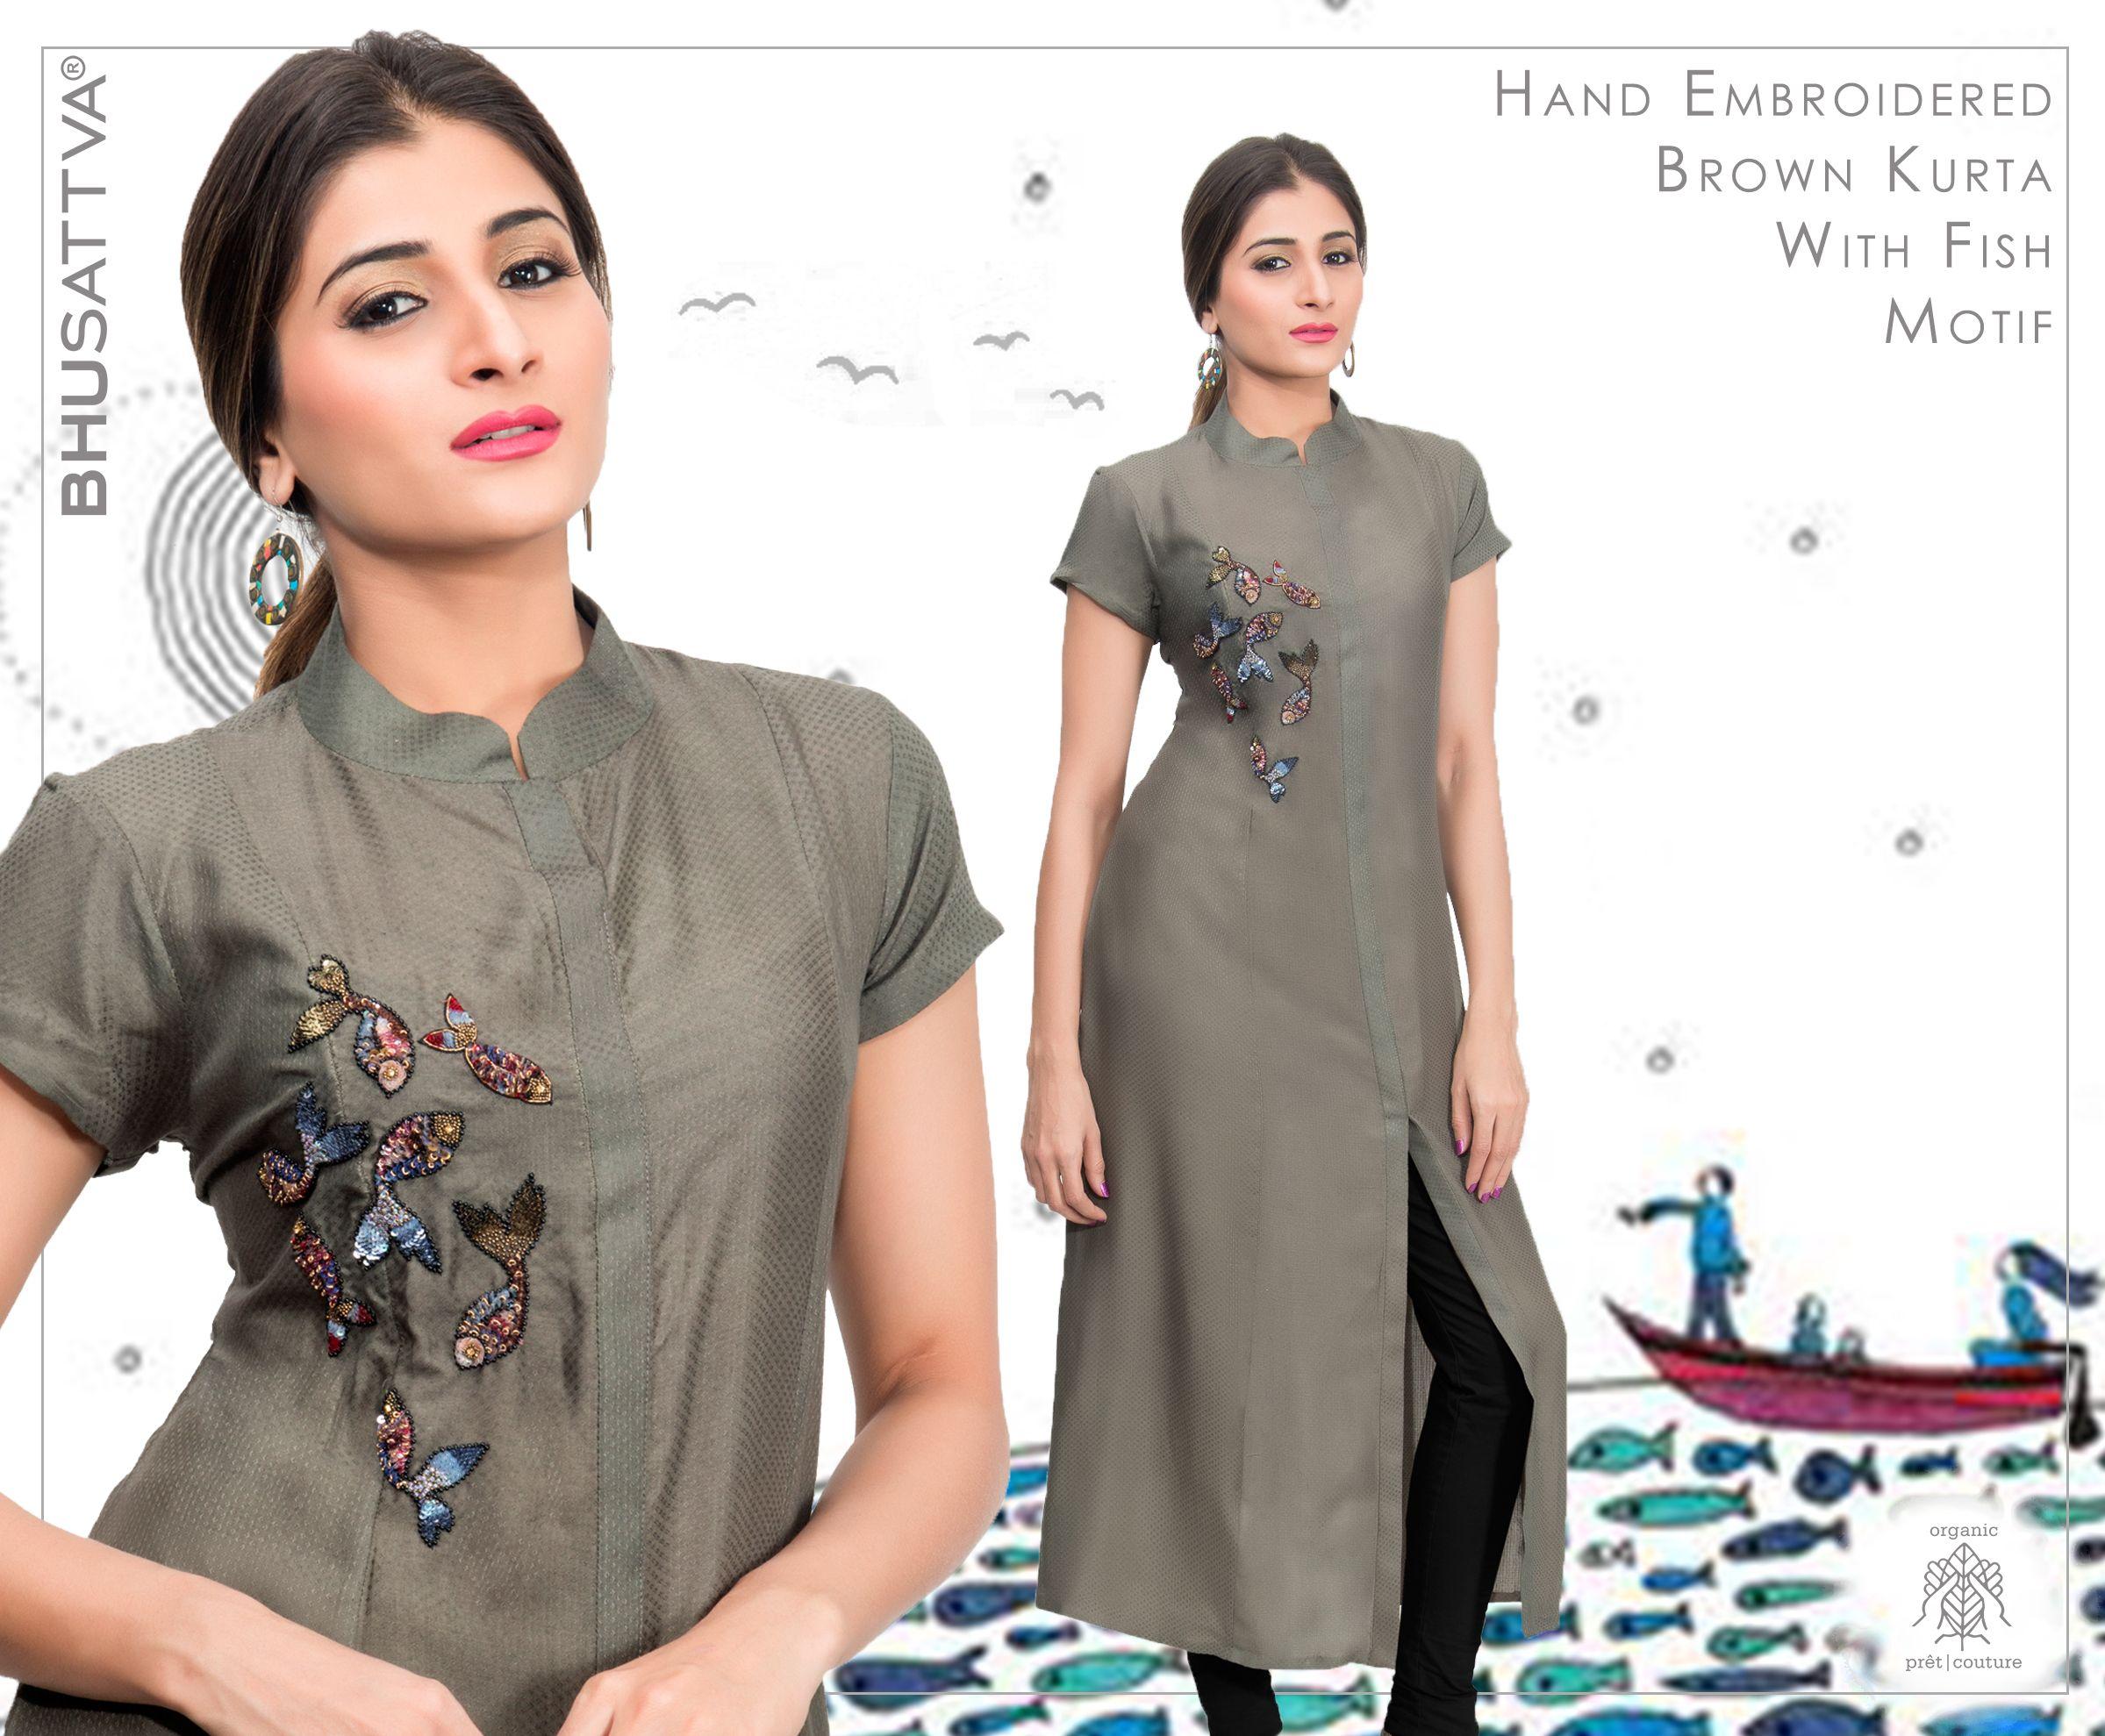 Flaunt this elegant brown kurta with hand embroidery, from the house of #Bhusattva • • • • #Bhusattva #Organic #Pret #Couture #Sequins #Kurta #HandEmbroidered #SkinFriendly #BreatheEasy #ReflectOrganic #RevealYourself #iWearBhusattva #BelieveWhatYouWear #TrustNature #MysticalNature #CloseToNature #OrganicIdeology #OrganicCollection #NaturalDyes #EcoFashion #OrganicFashion #SustainableFashion #GoOrganic #WearOrganic #DesignerLabel #DesignerWear #EcoFriendly